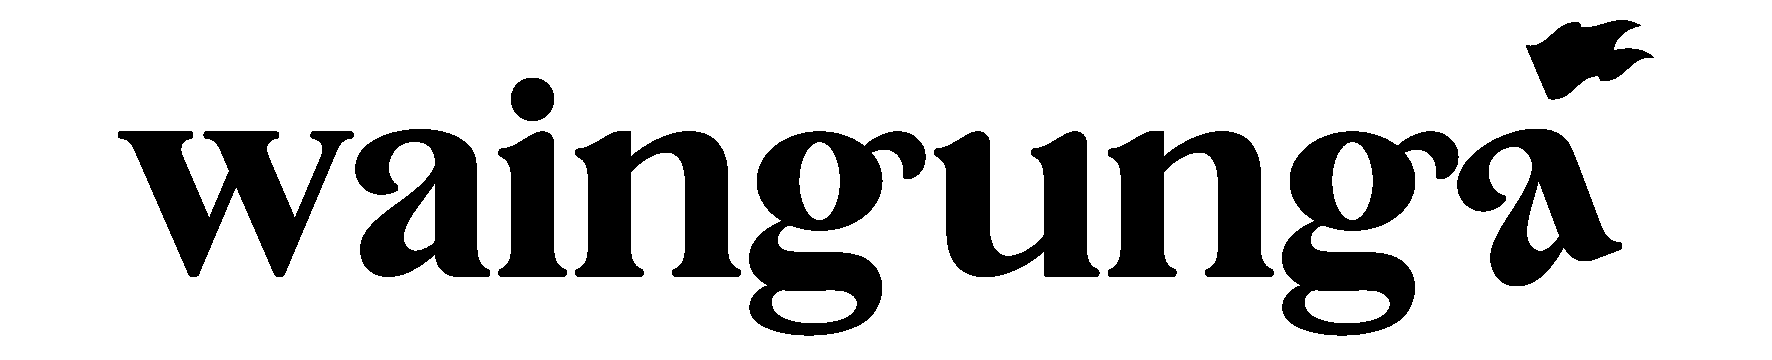 Waingunga-mi